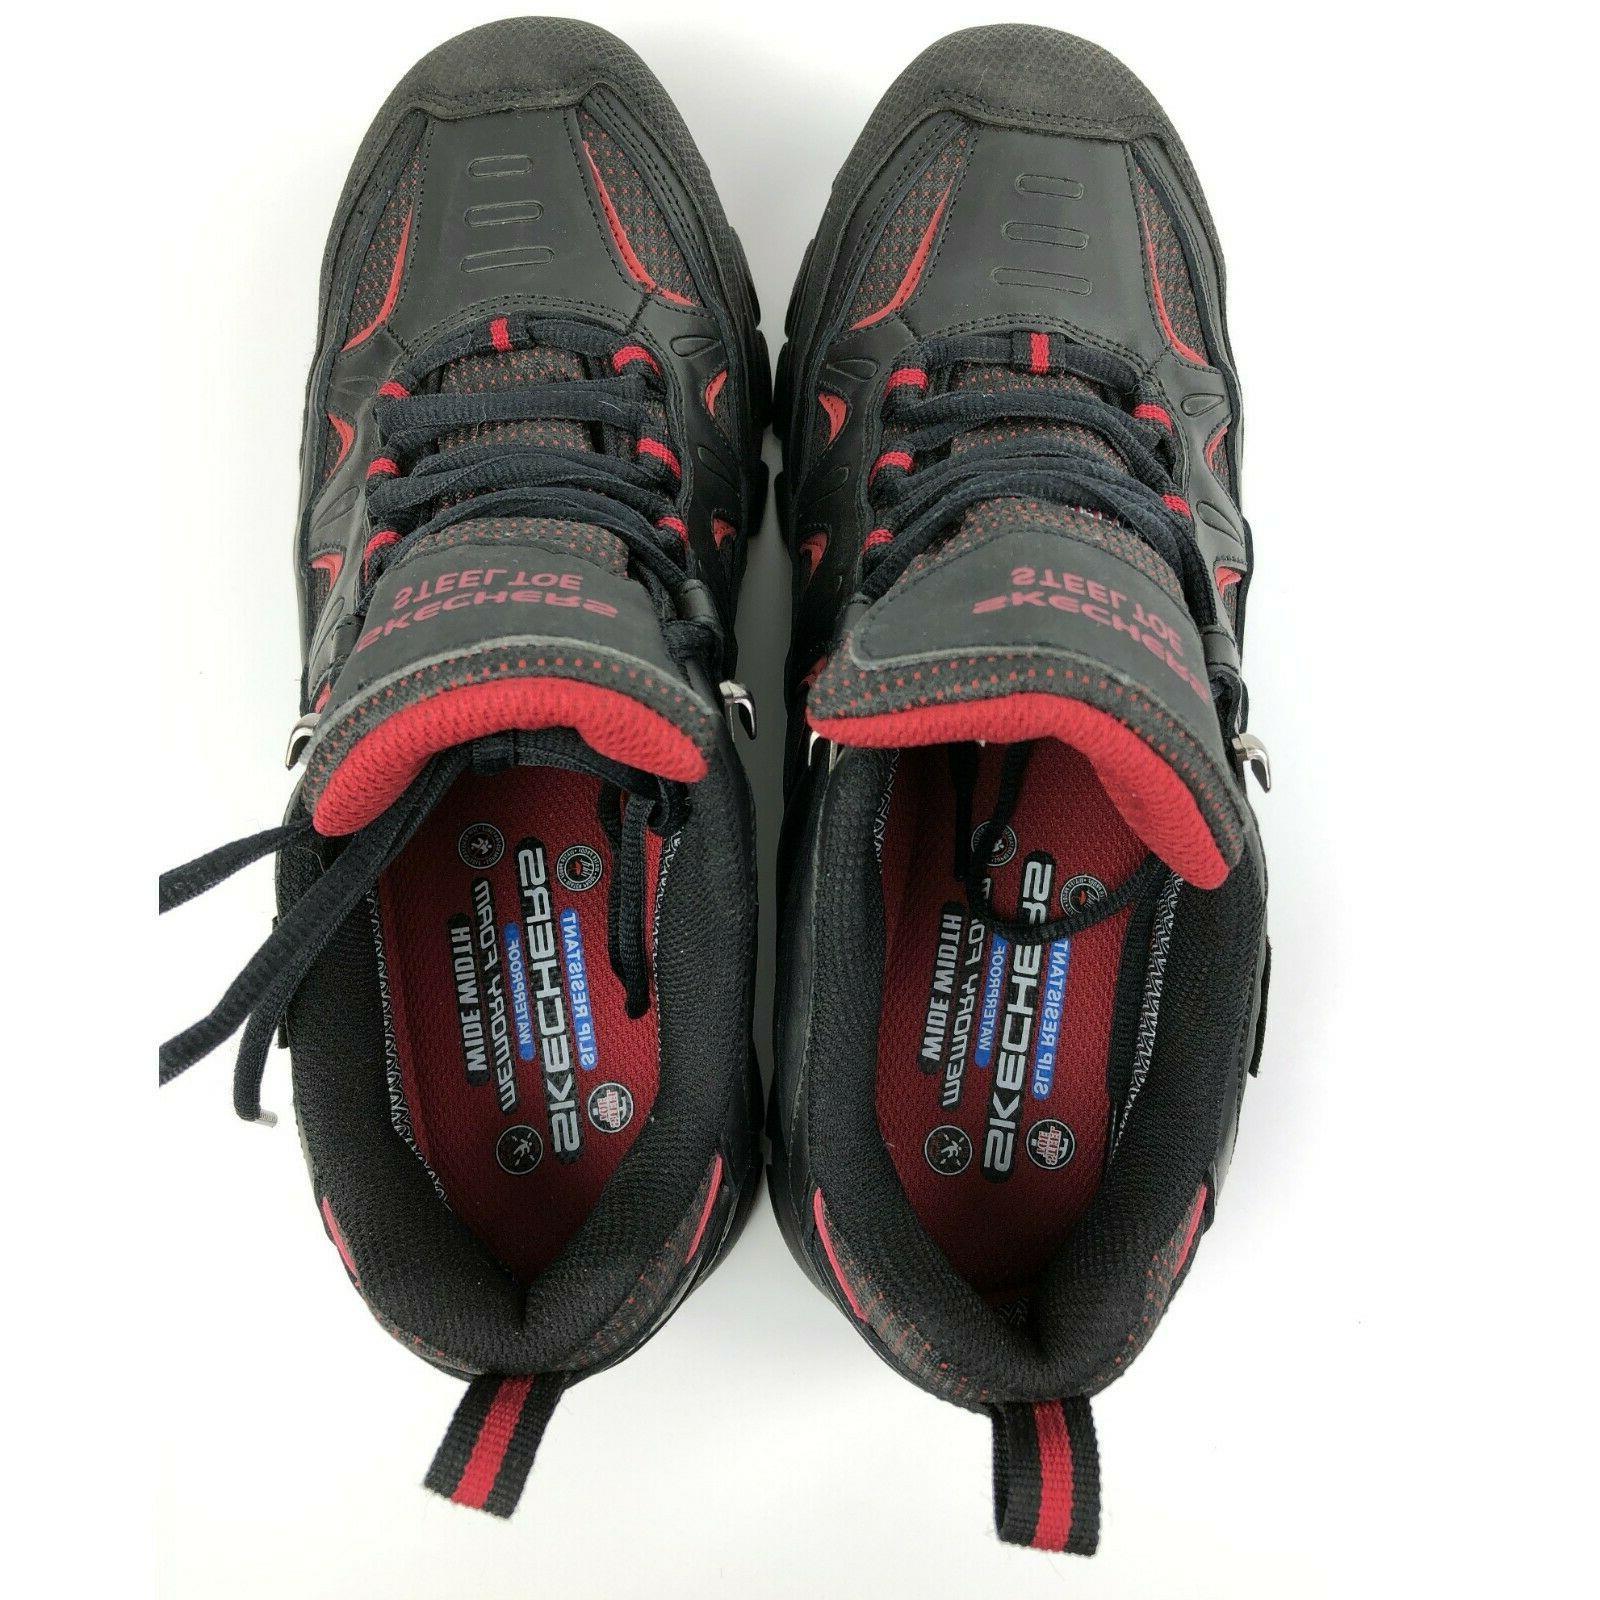 Sketchers Mens 9.5 Safety Toe Shoes 8.5